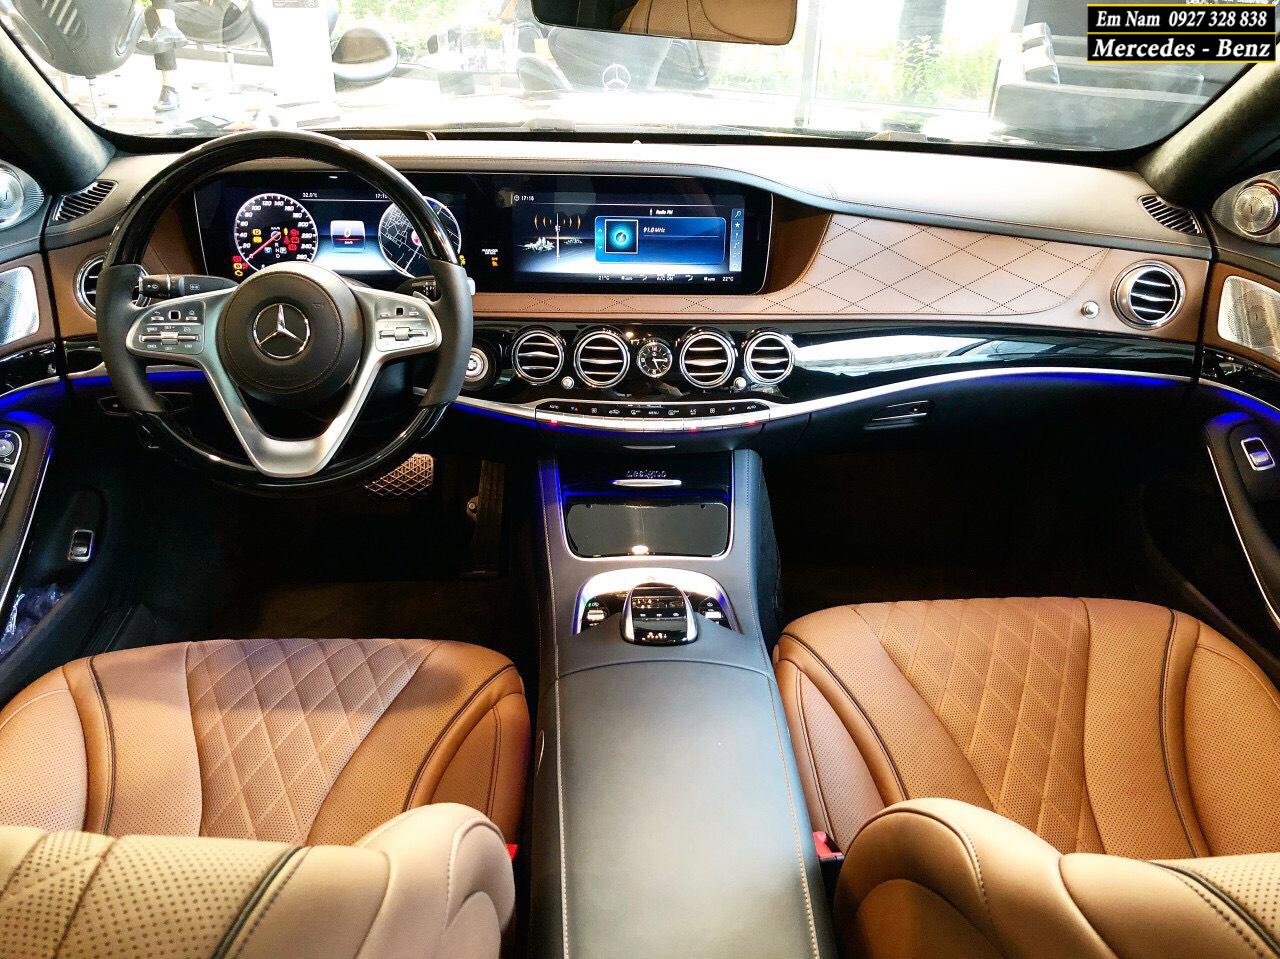 noi-that-mercedes-s450-l-luxury-mercedes-hai-phong-3